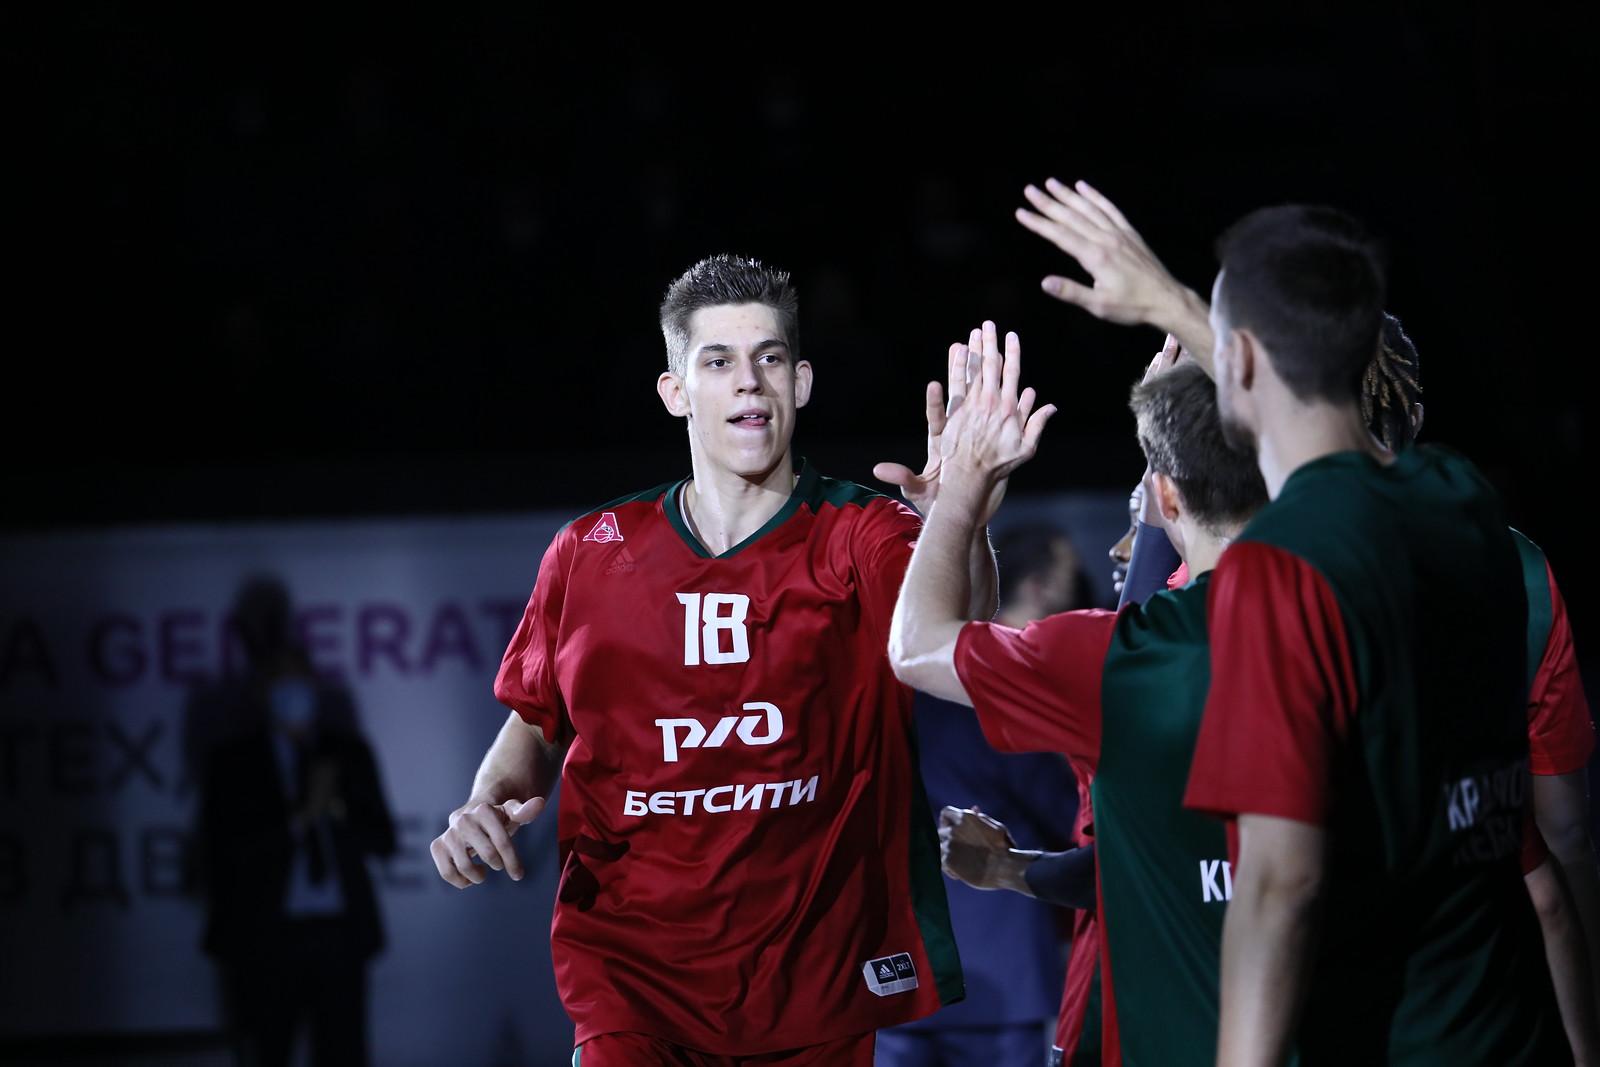 23/05/2021 UNICS-Lokomotiv 74:70